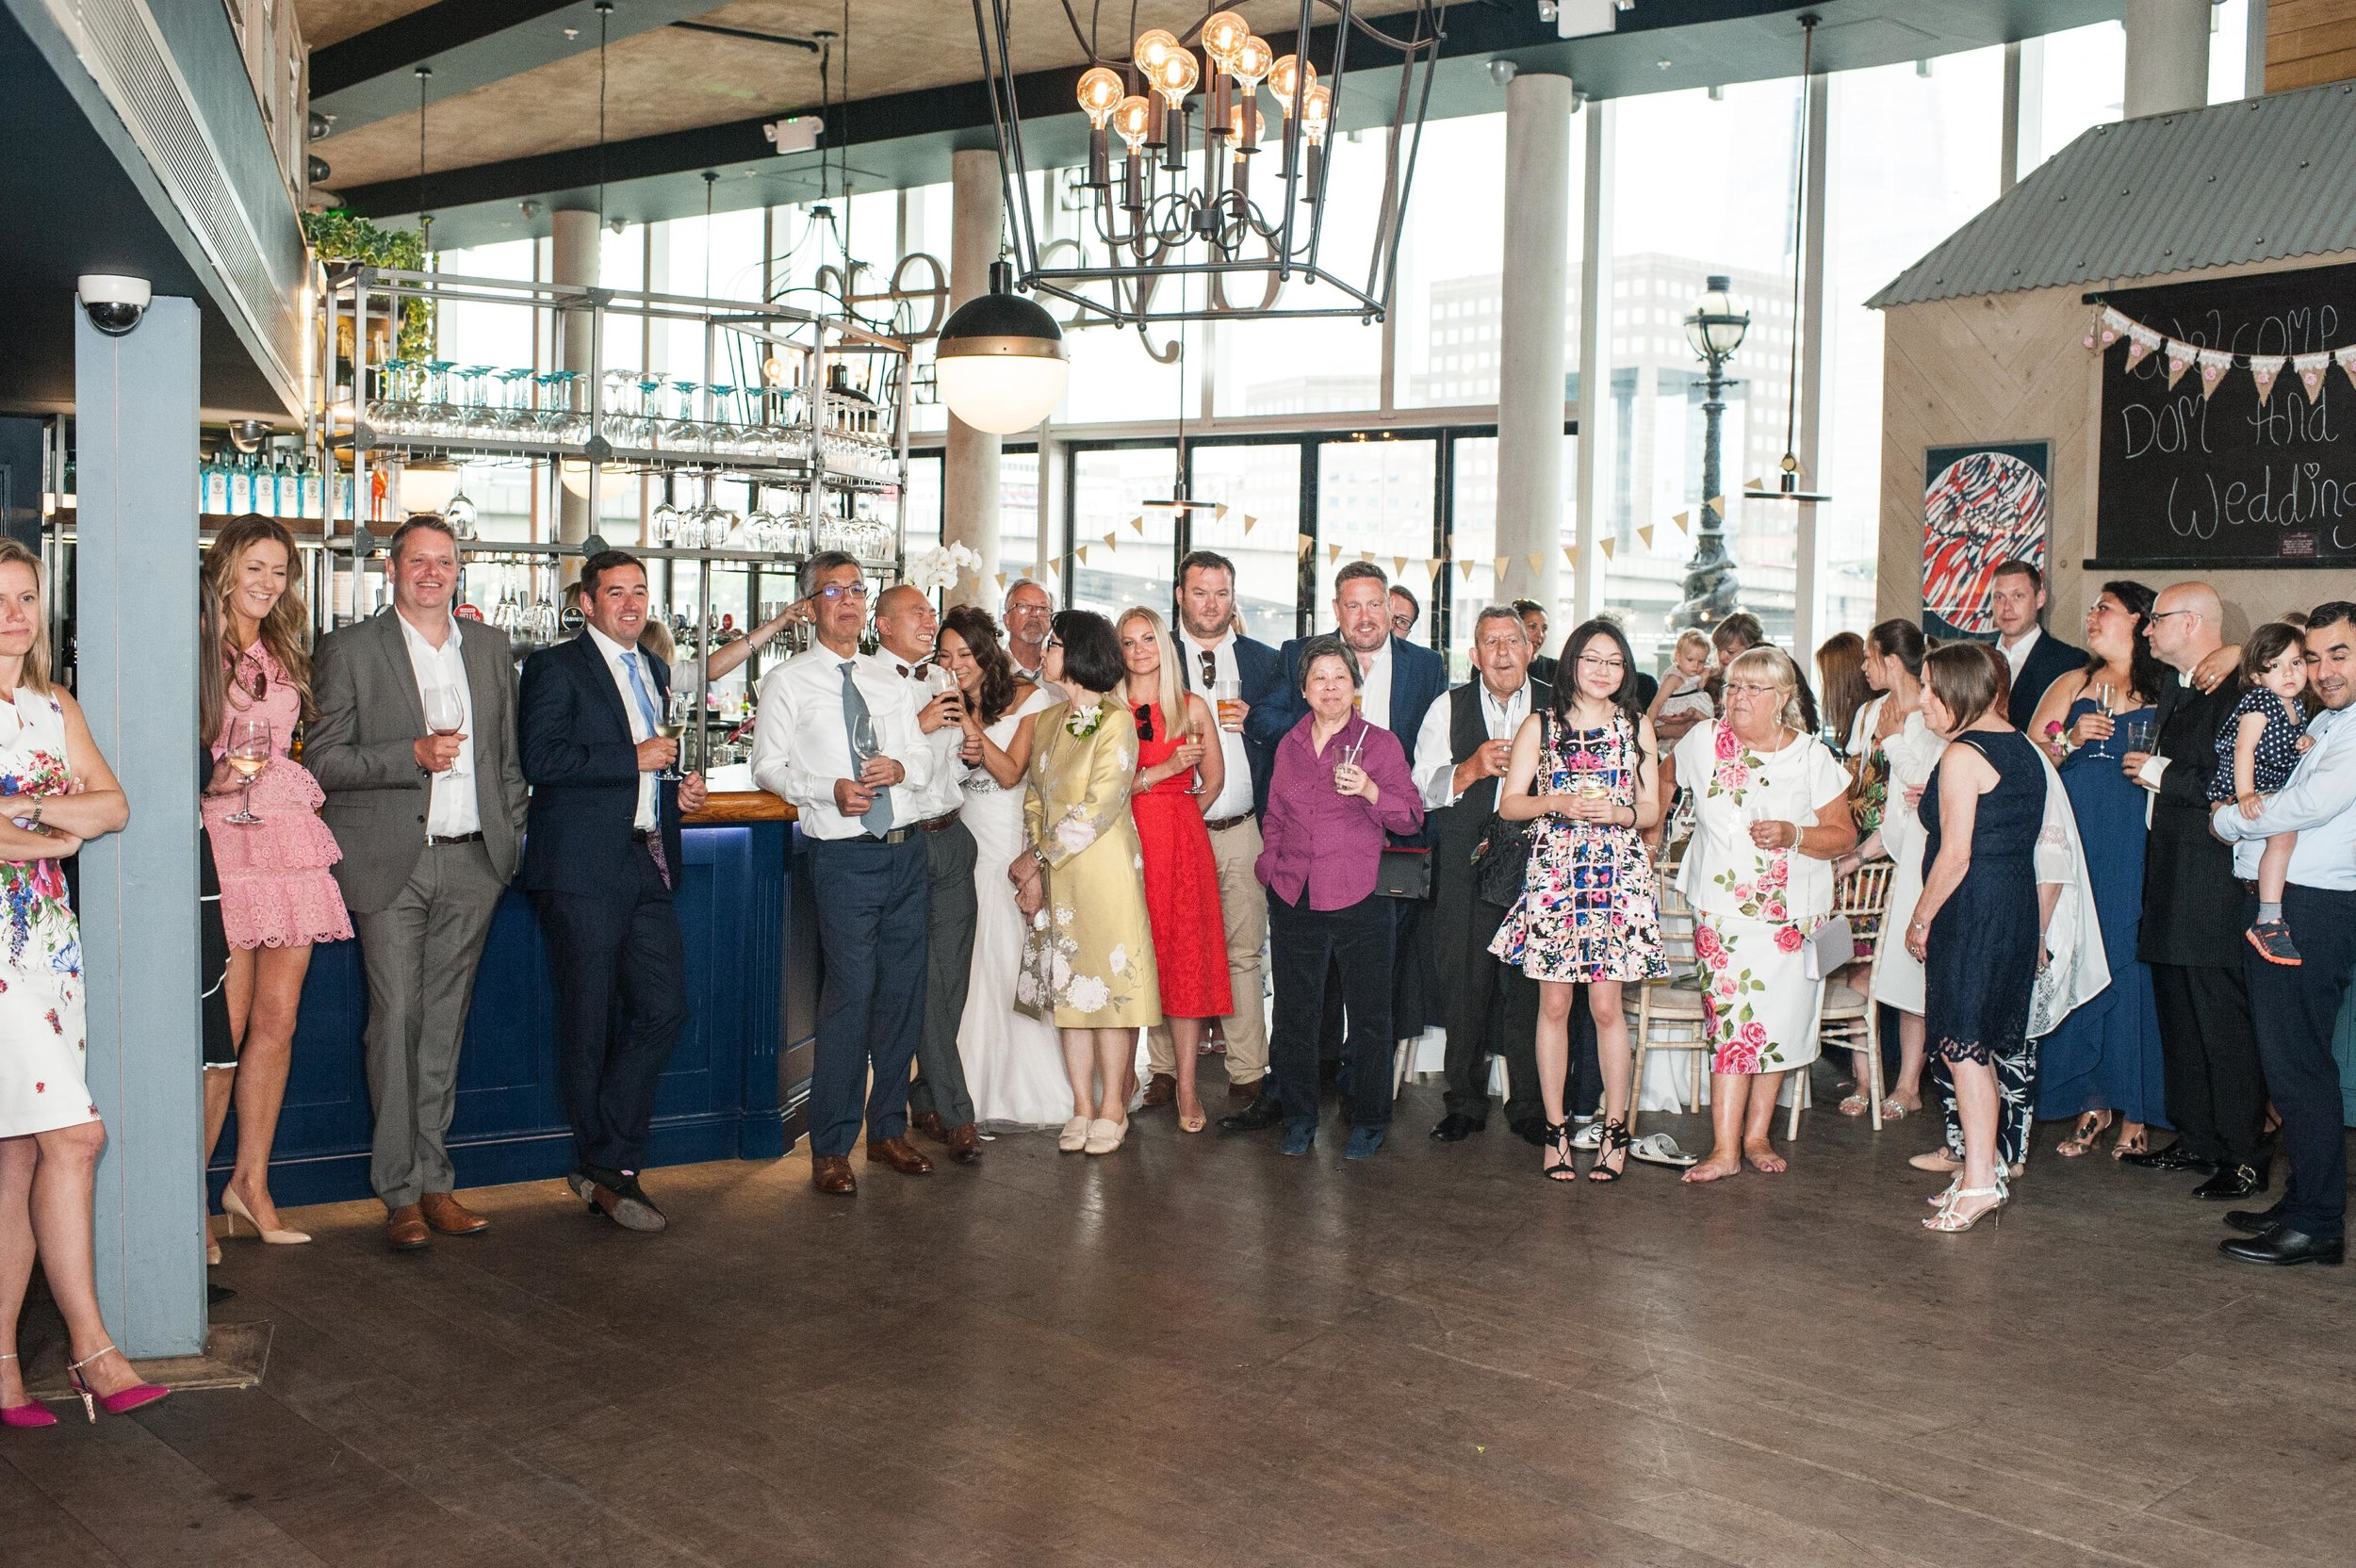 D&M_Marylebone Town Hall Wedding (227 of 239).jpg